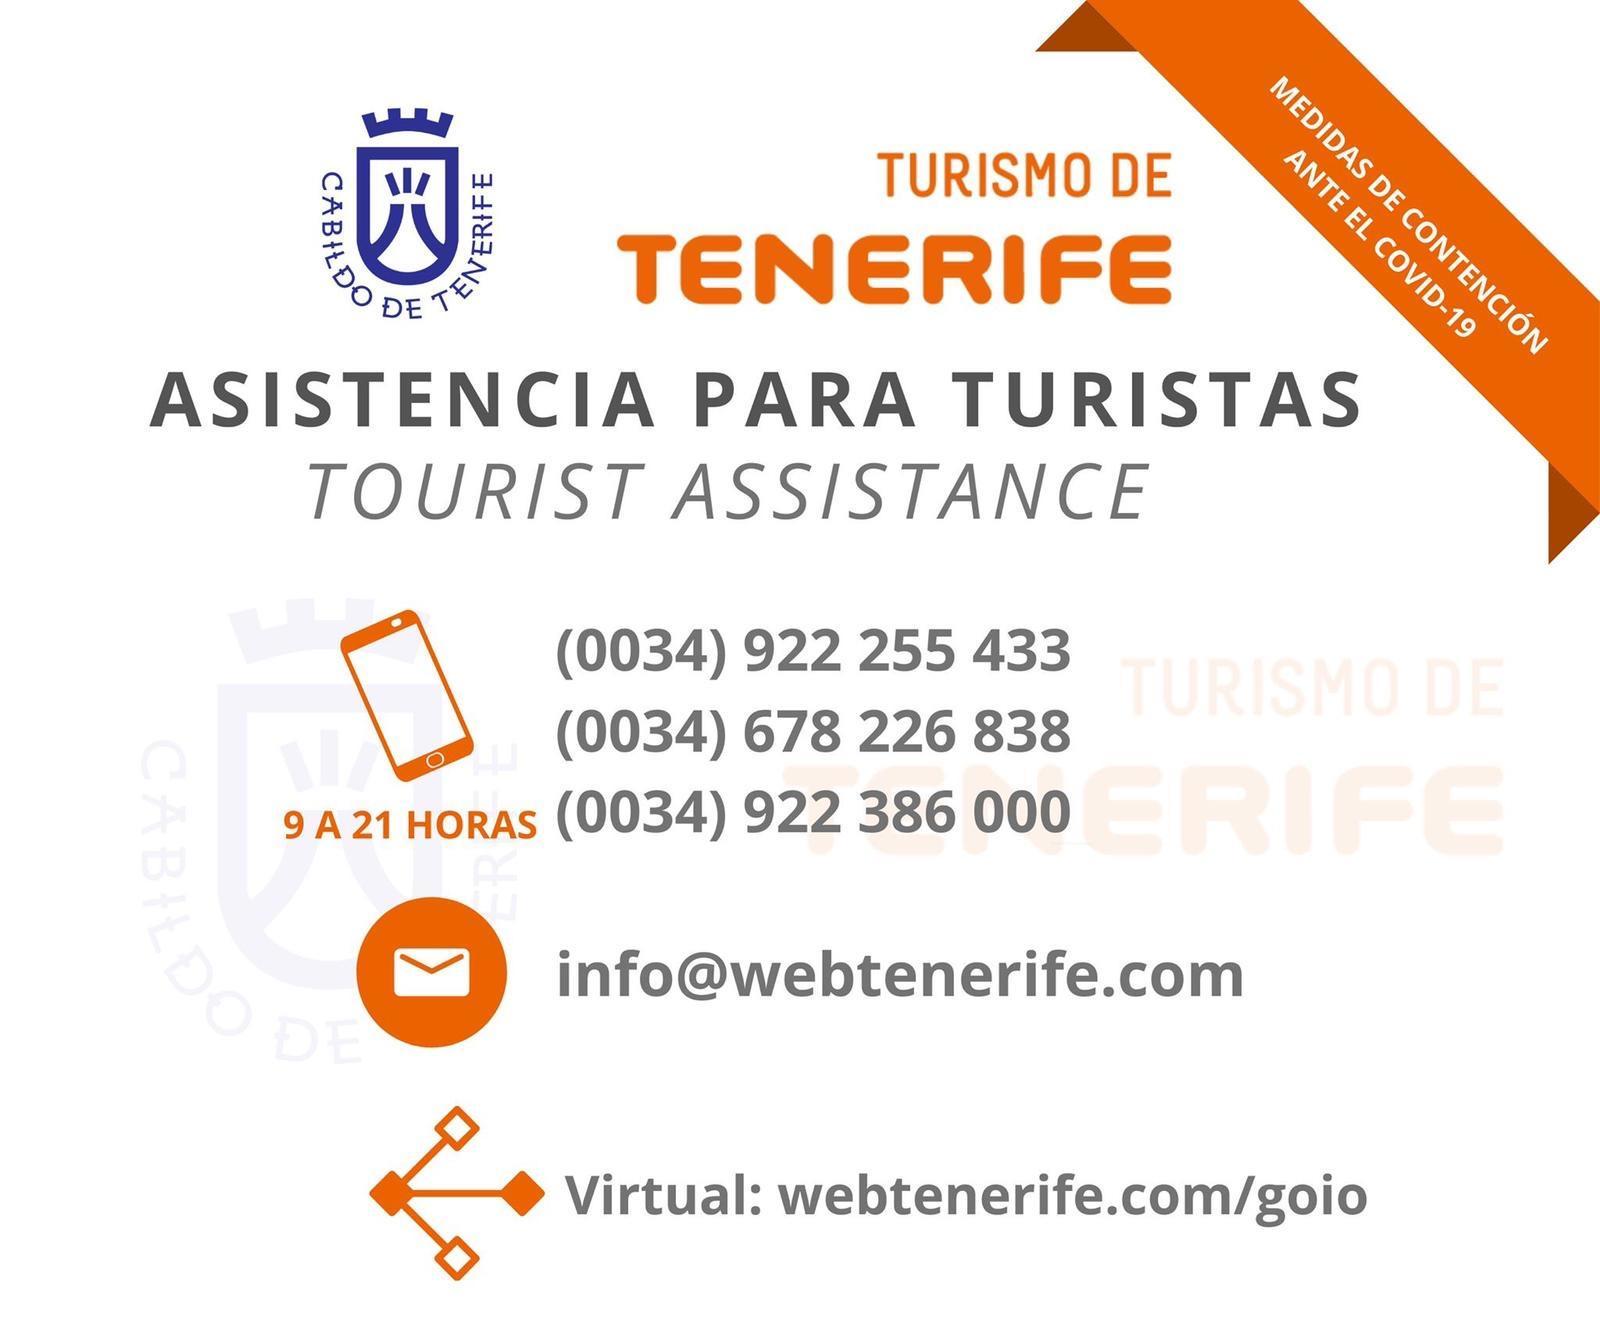 C:\Users\Usuario\Downloads\90686316_2312613519040526_8864352606730846208_o.jpg